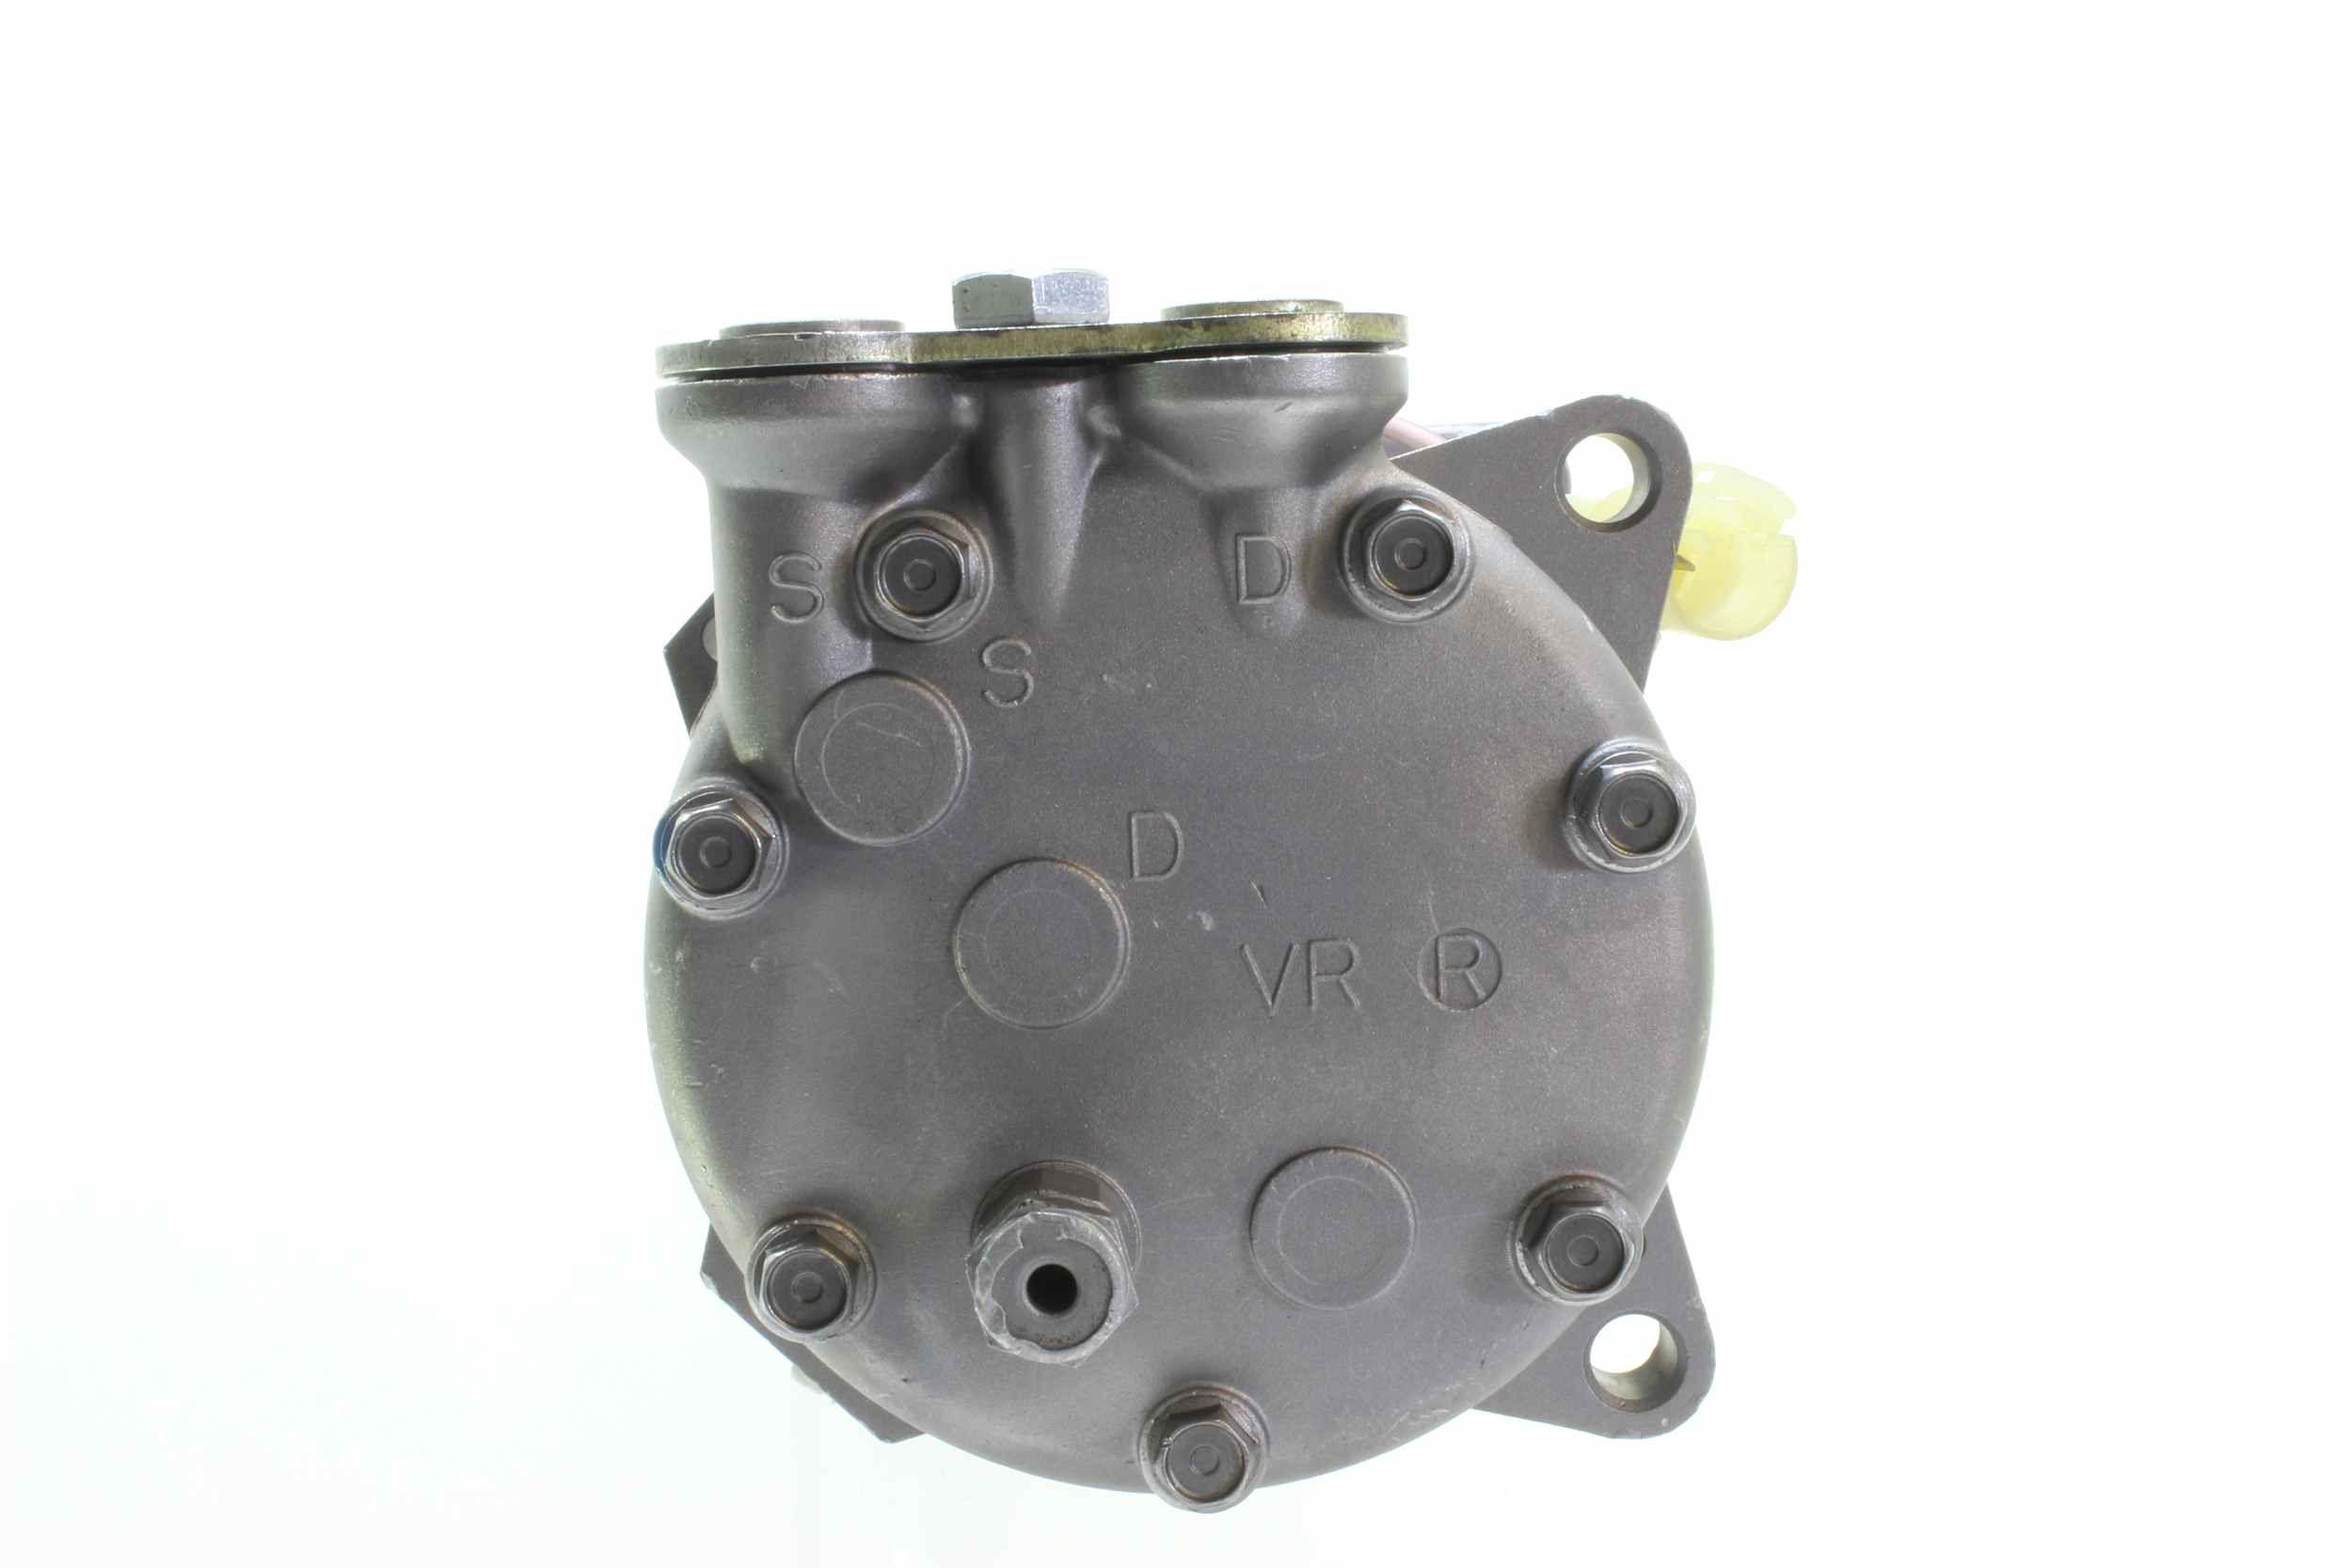 10550346 Kompressor, Klimaanlage ALANKO 550346 - Große Auswahl - stark reduziert